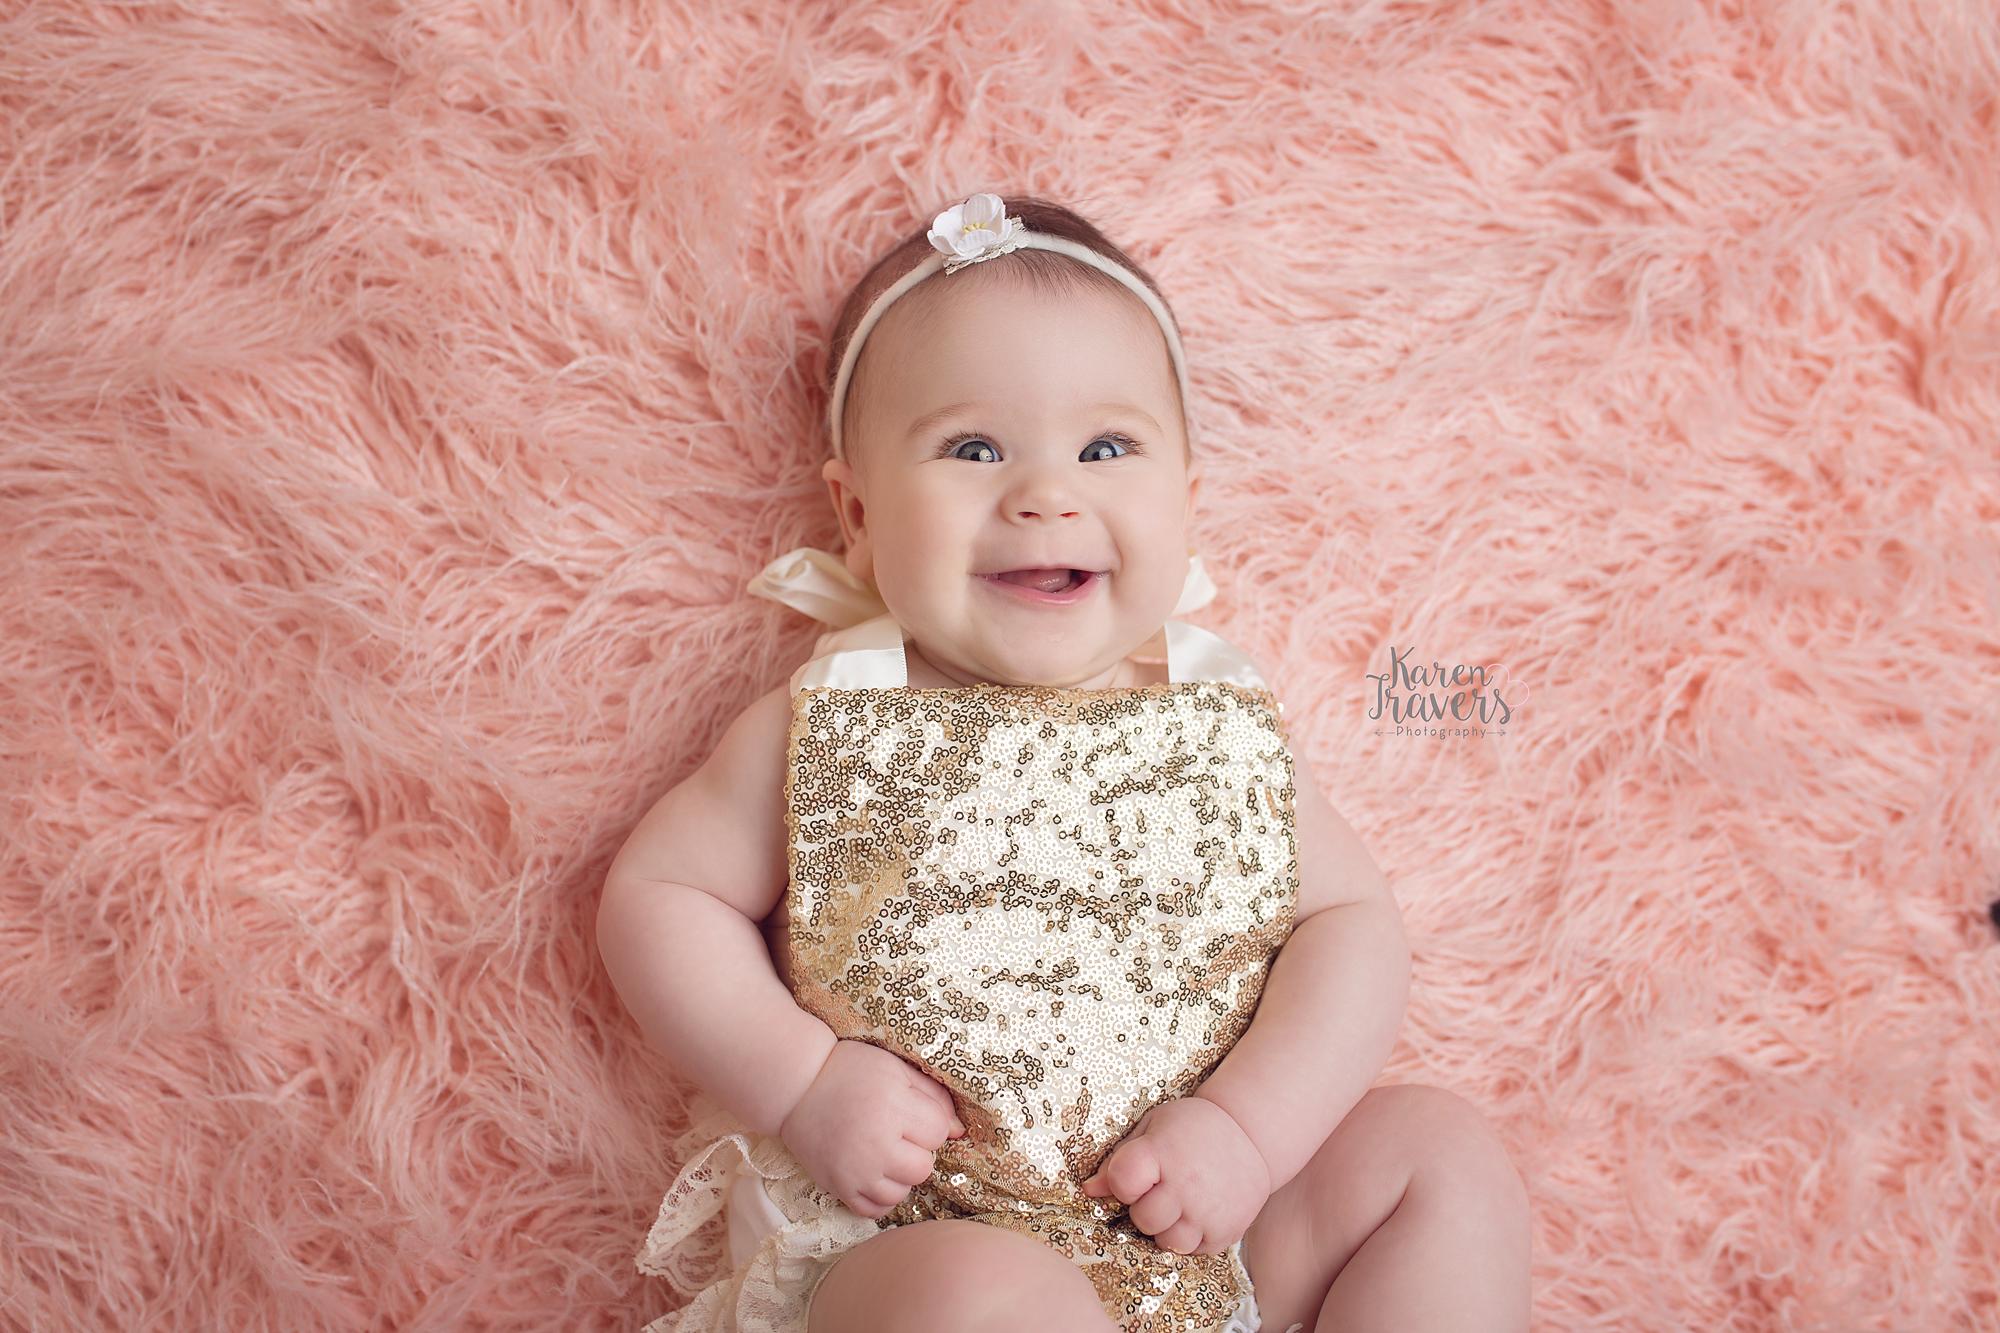 anchorage-newborn-photographer-2.png